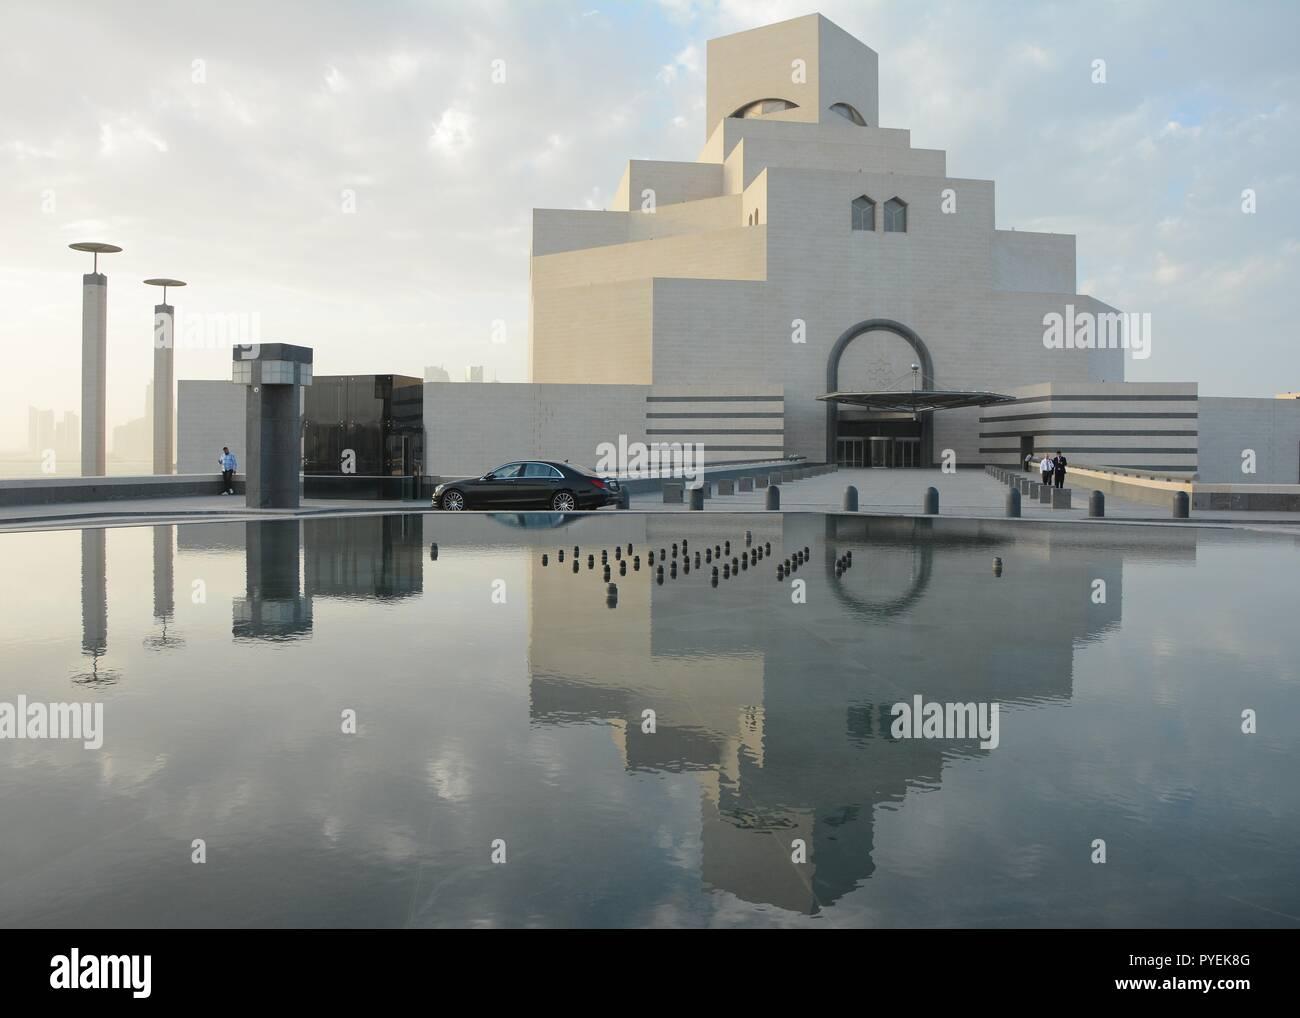 The Museum of Islamic Art, Doha, Qatar Stock Photo